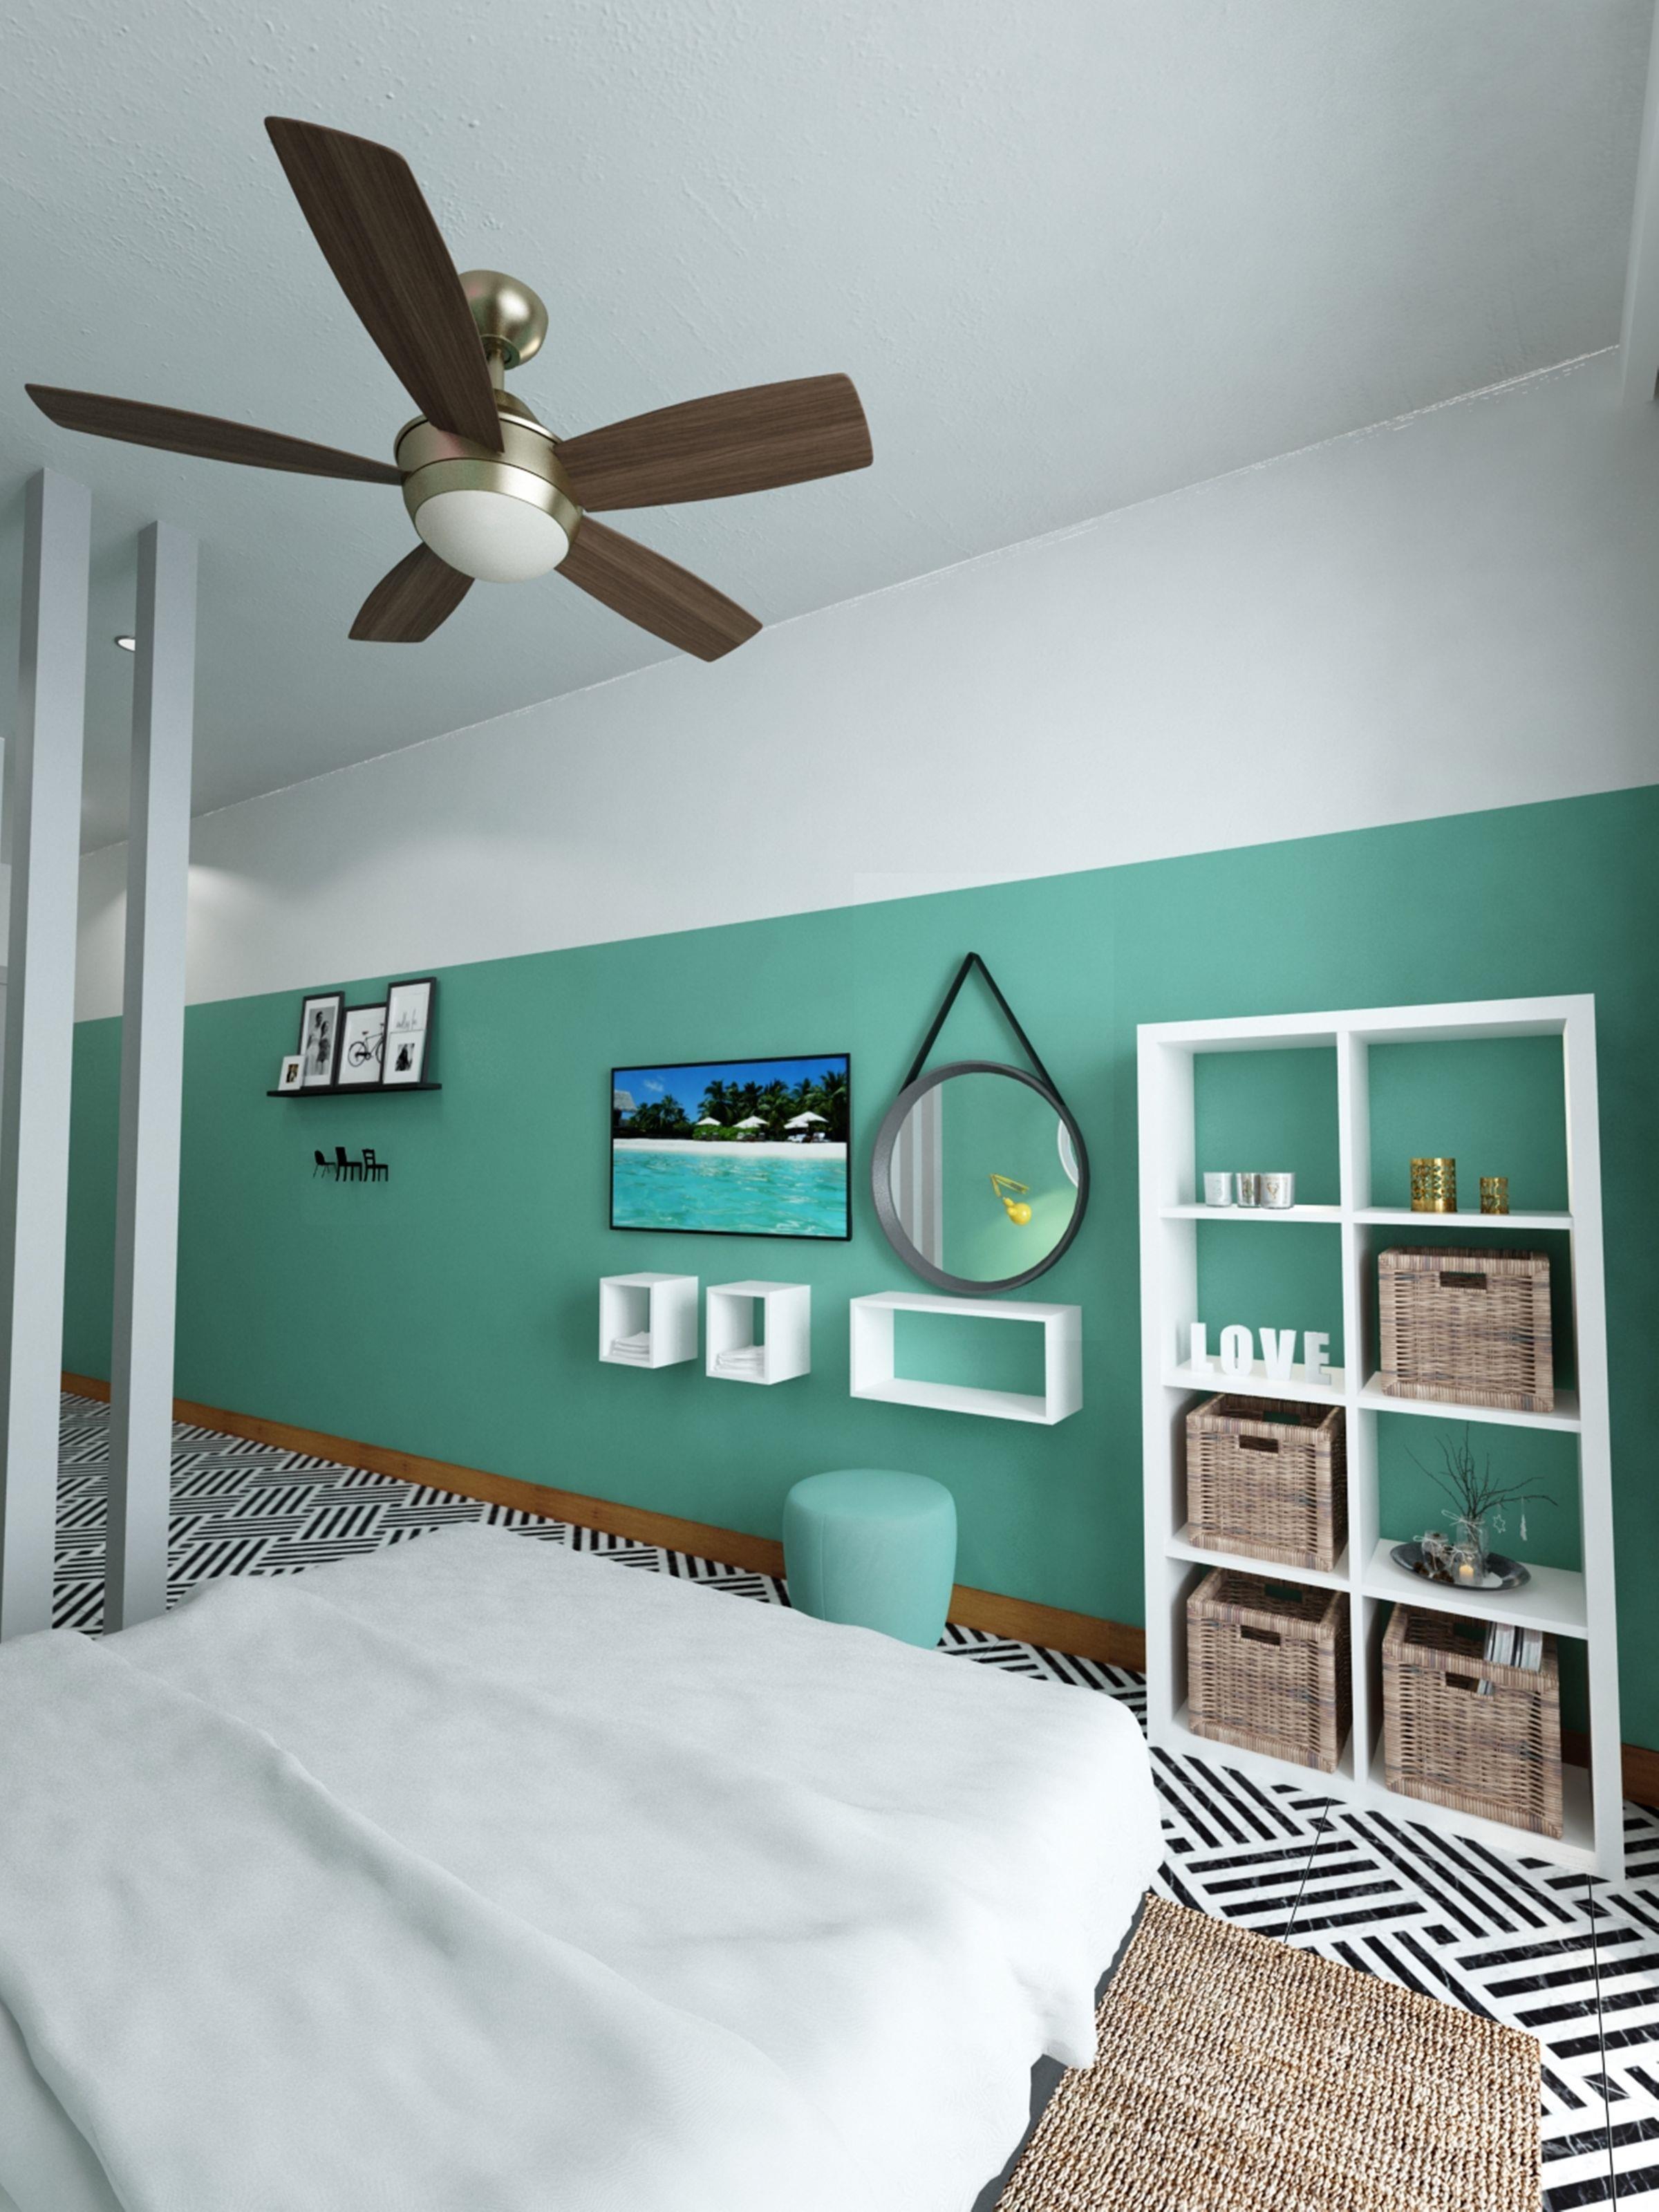 http://www.orextravel.sk/OREX/hotelphotos/anjeliq-downtown-hotel-general-0022.jpg